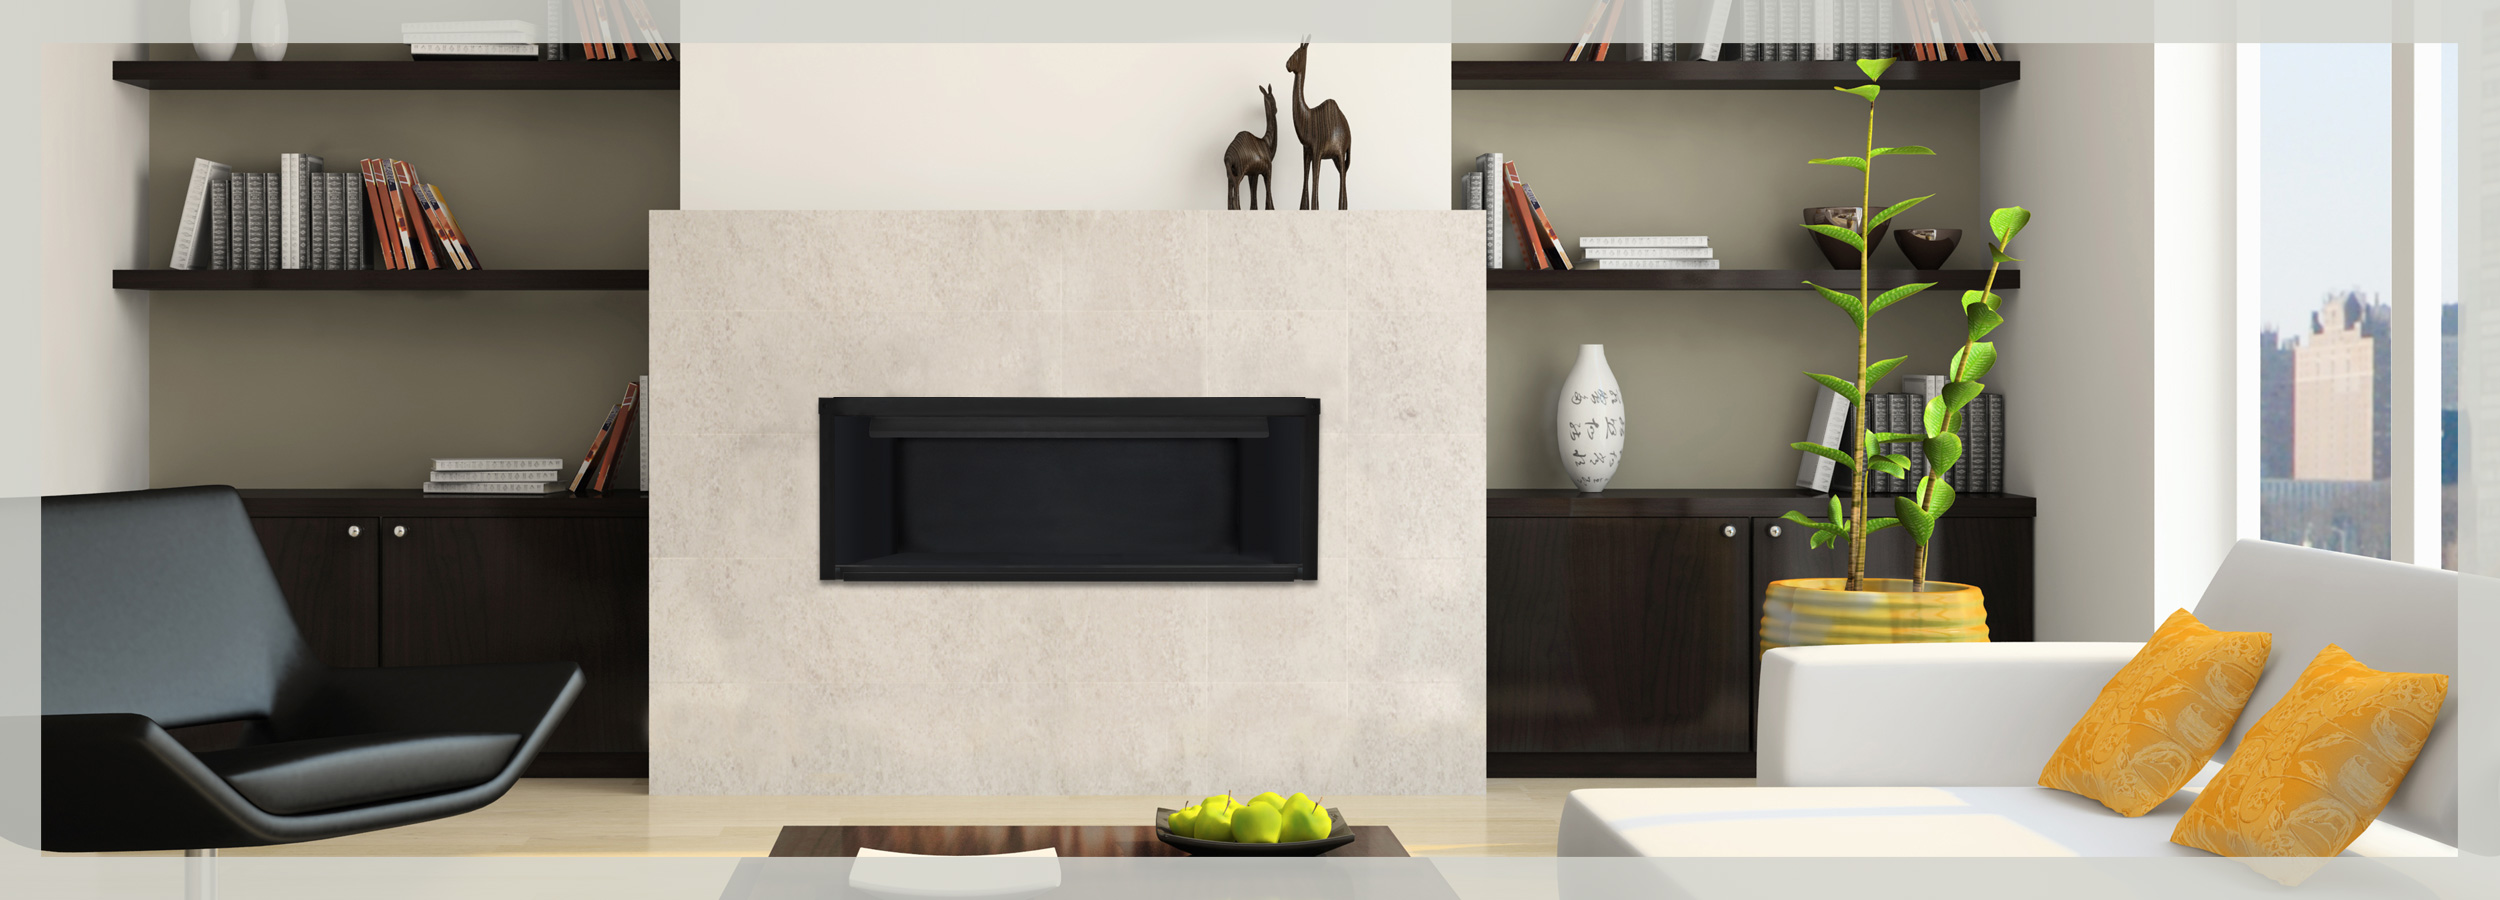 2500x900-fds-fireplace-slider1